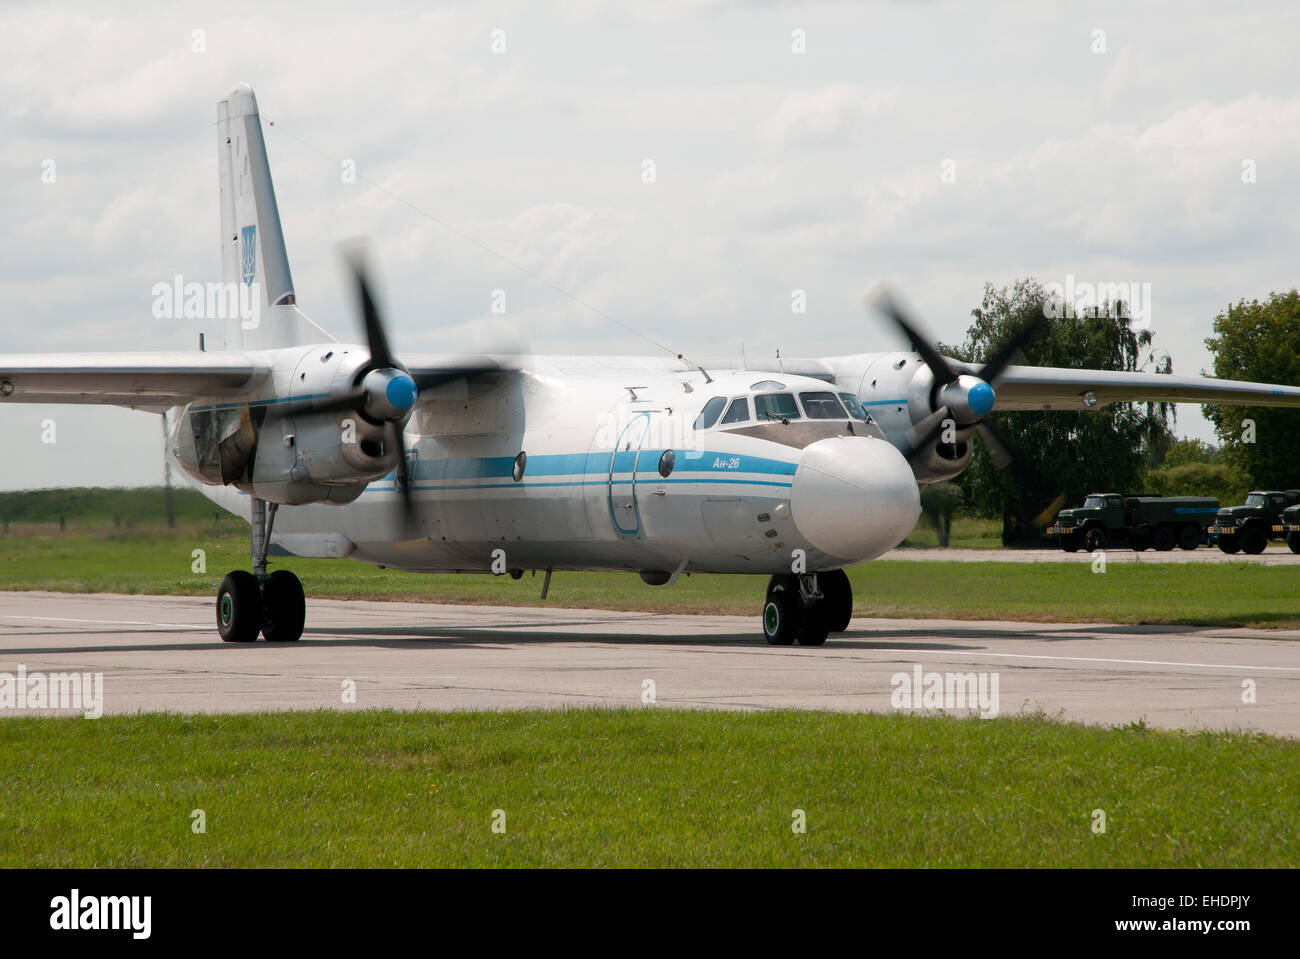 Aircraft Antonov An-26 Ukrainian Air Force  was taxiing to the runway. - Stock Image